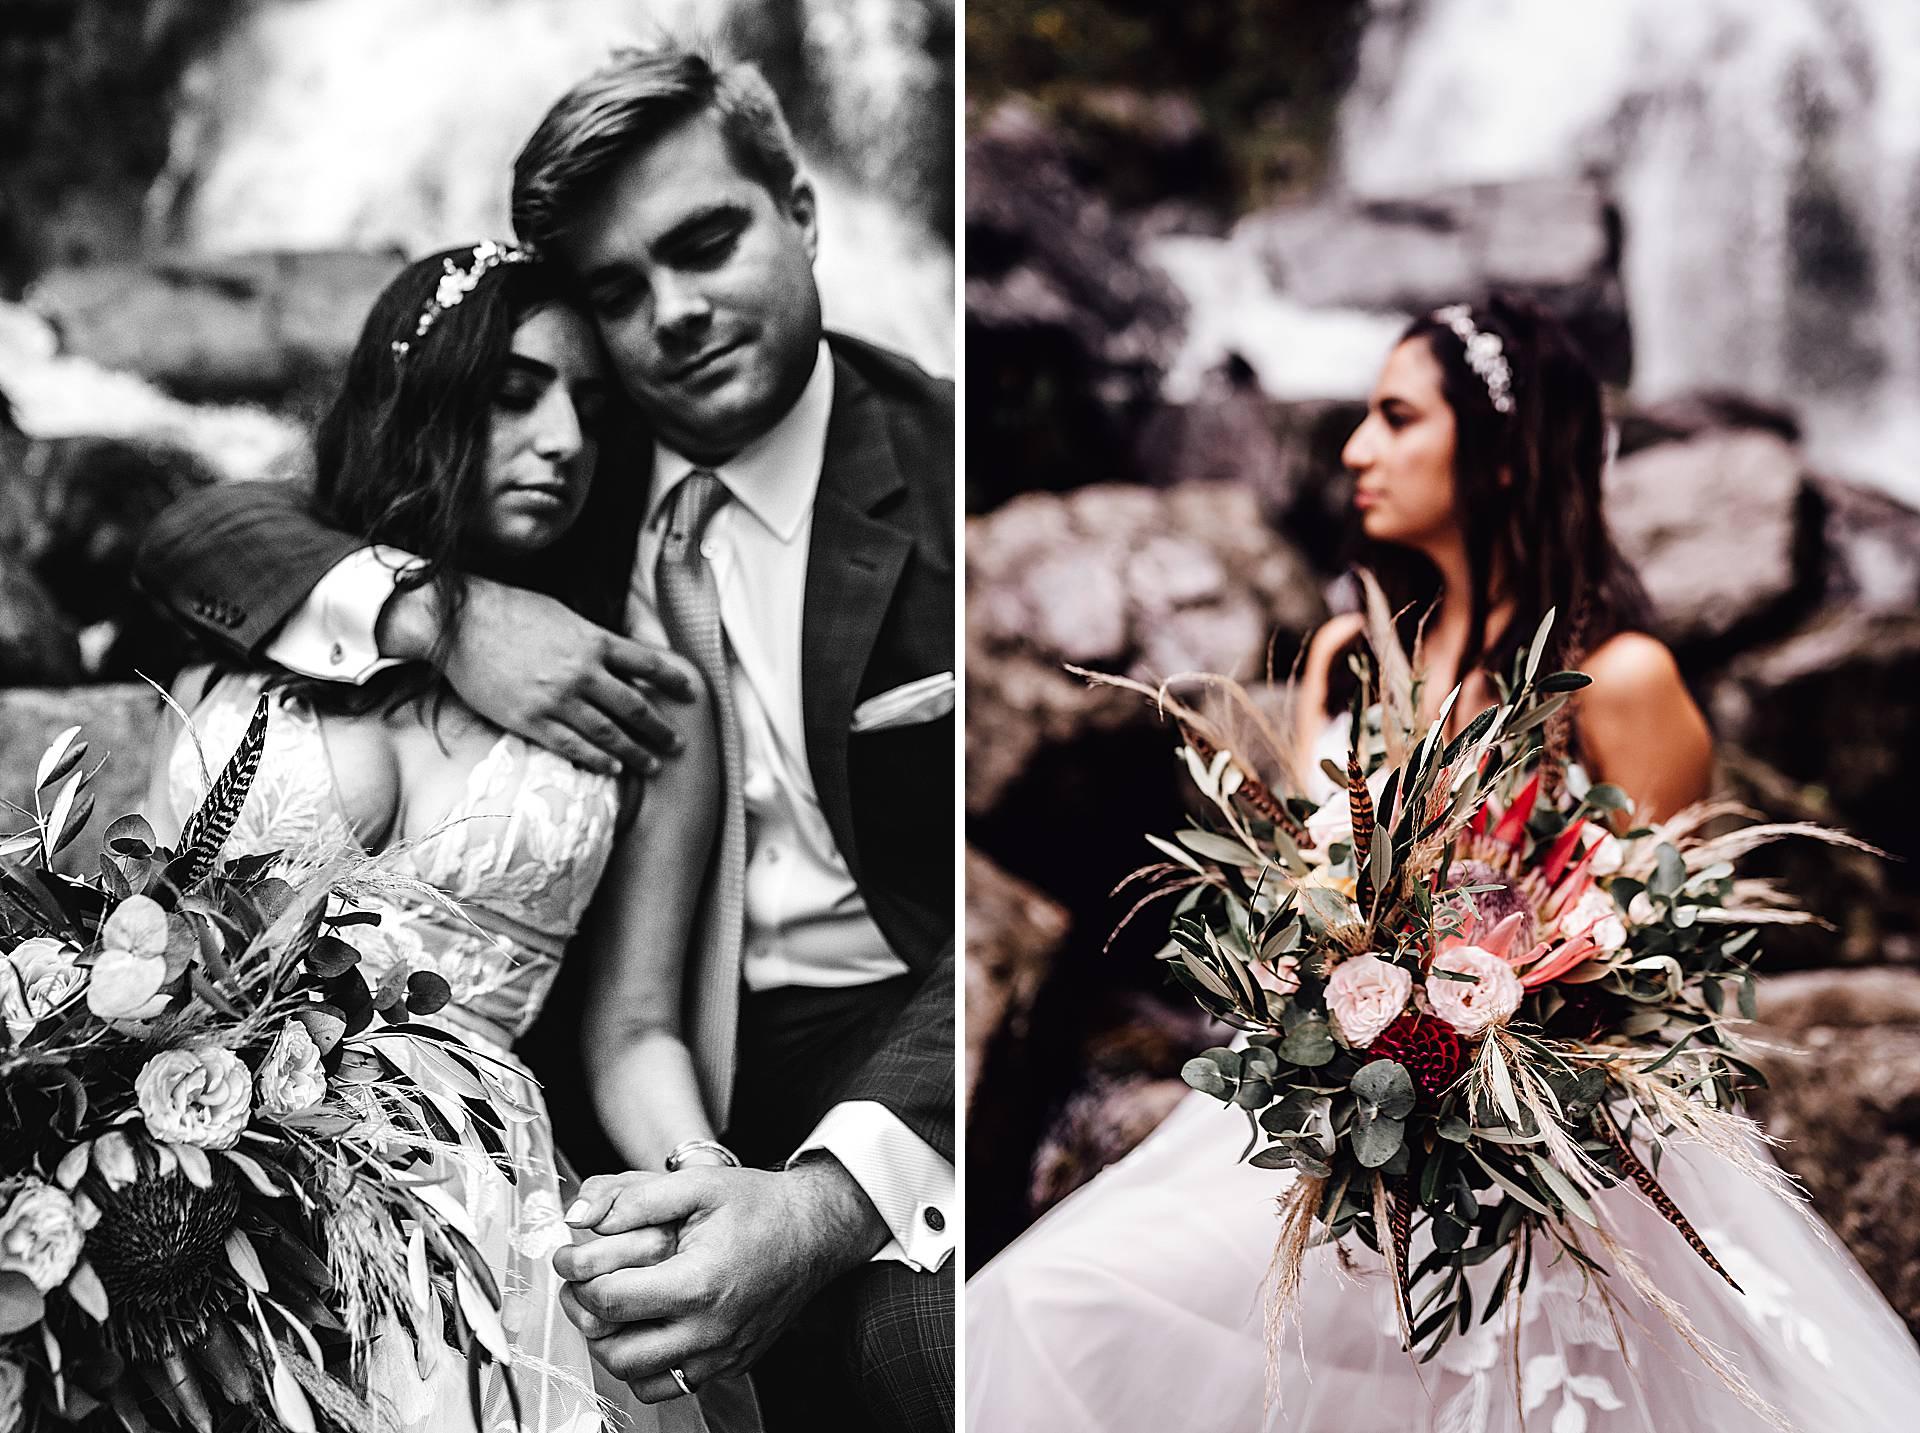 Brautstrauß aus Pampasgras